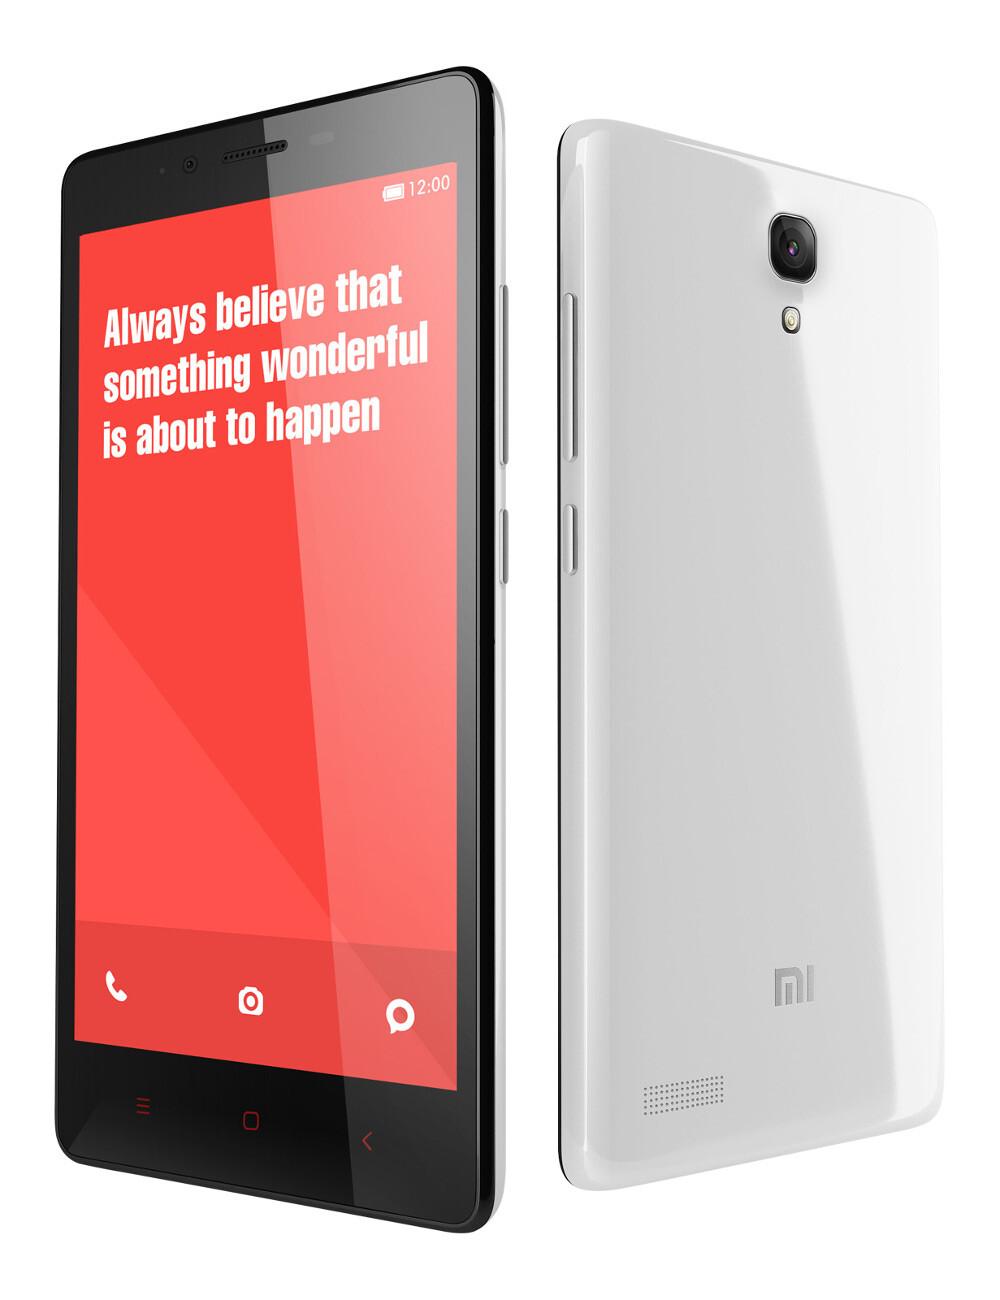 Xiaomi Redmi Note Prime Photos 2